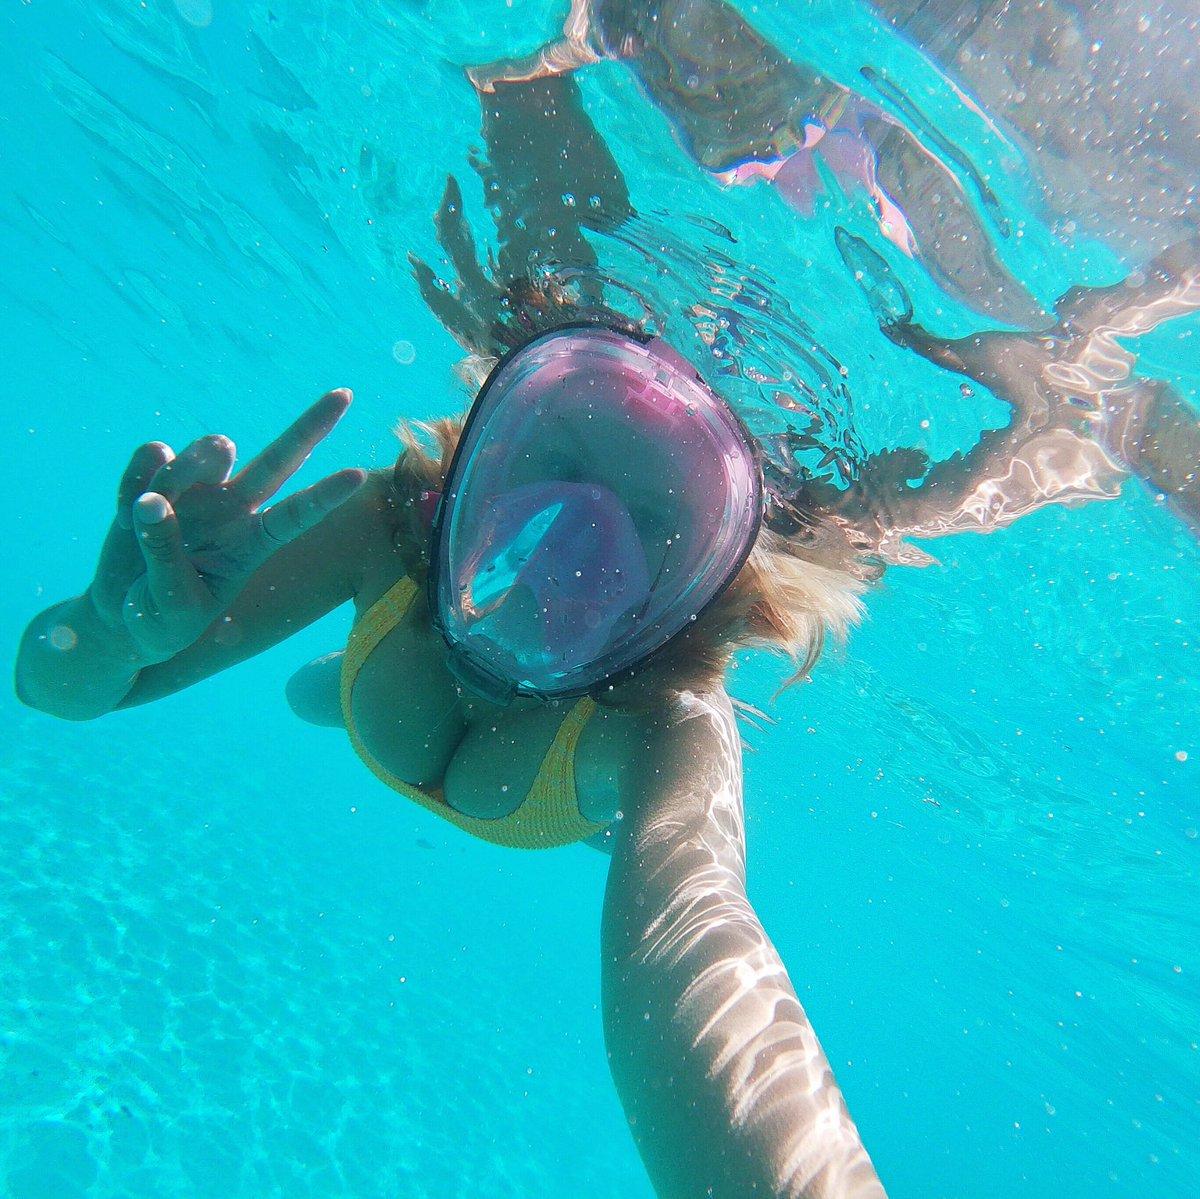 Ever wondered what #DarthVader looks like snorkelling? .... https://t.co/YQbjmatp5I